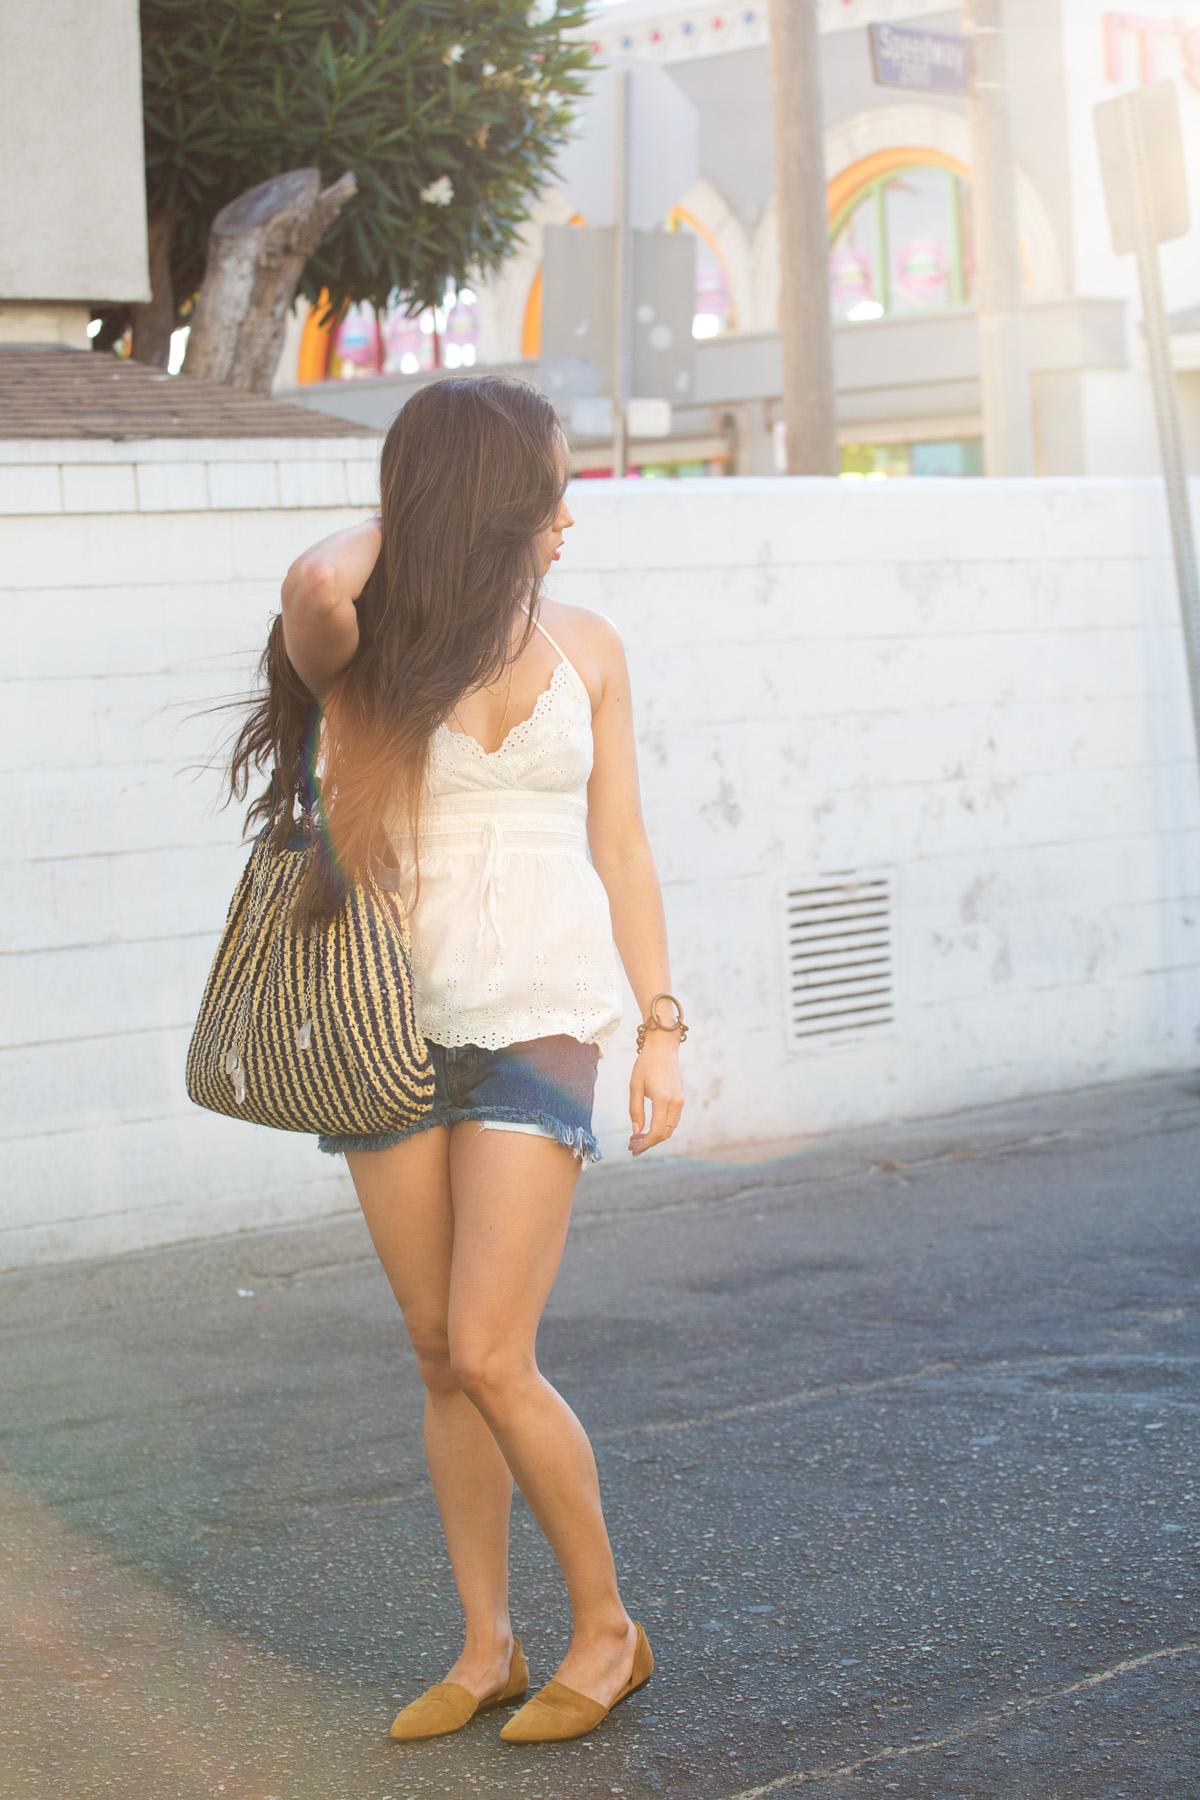 summer style, los angeles blog, fashion blog, style blog, la model, tarah smith handbag, zara top, cutoffs, jenni kayne flats, jenni kayne d'orsay, kelly wearstler bracelet, venice beach